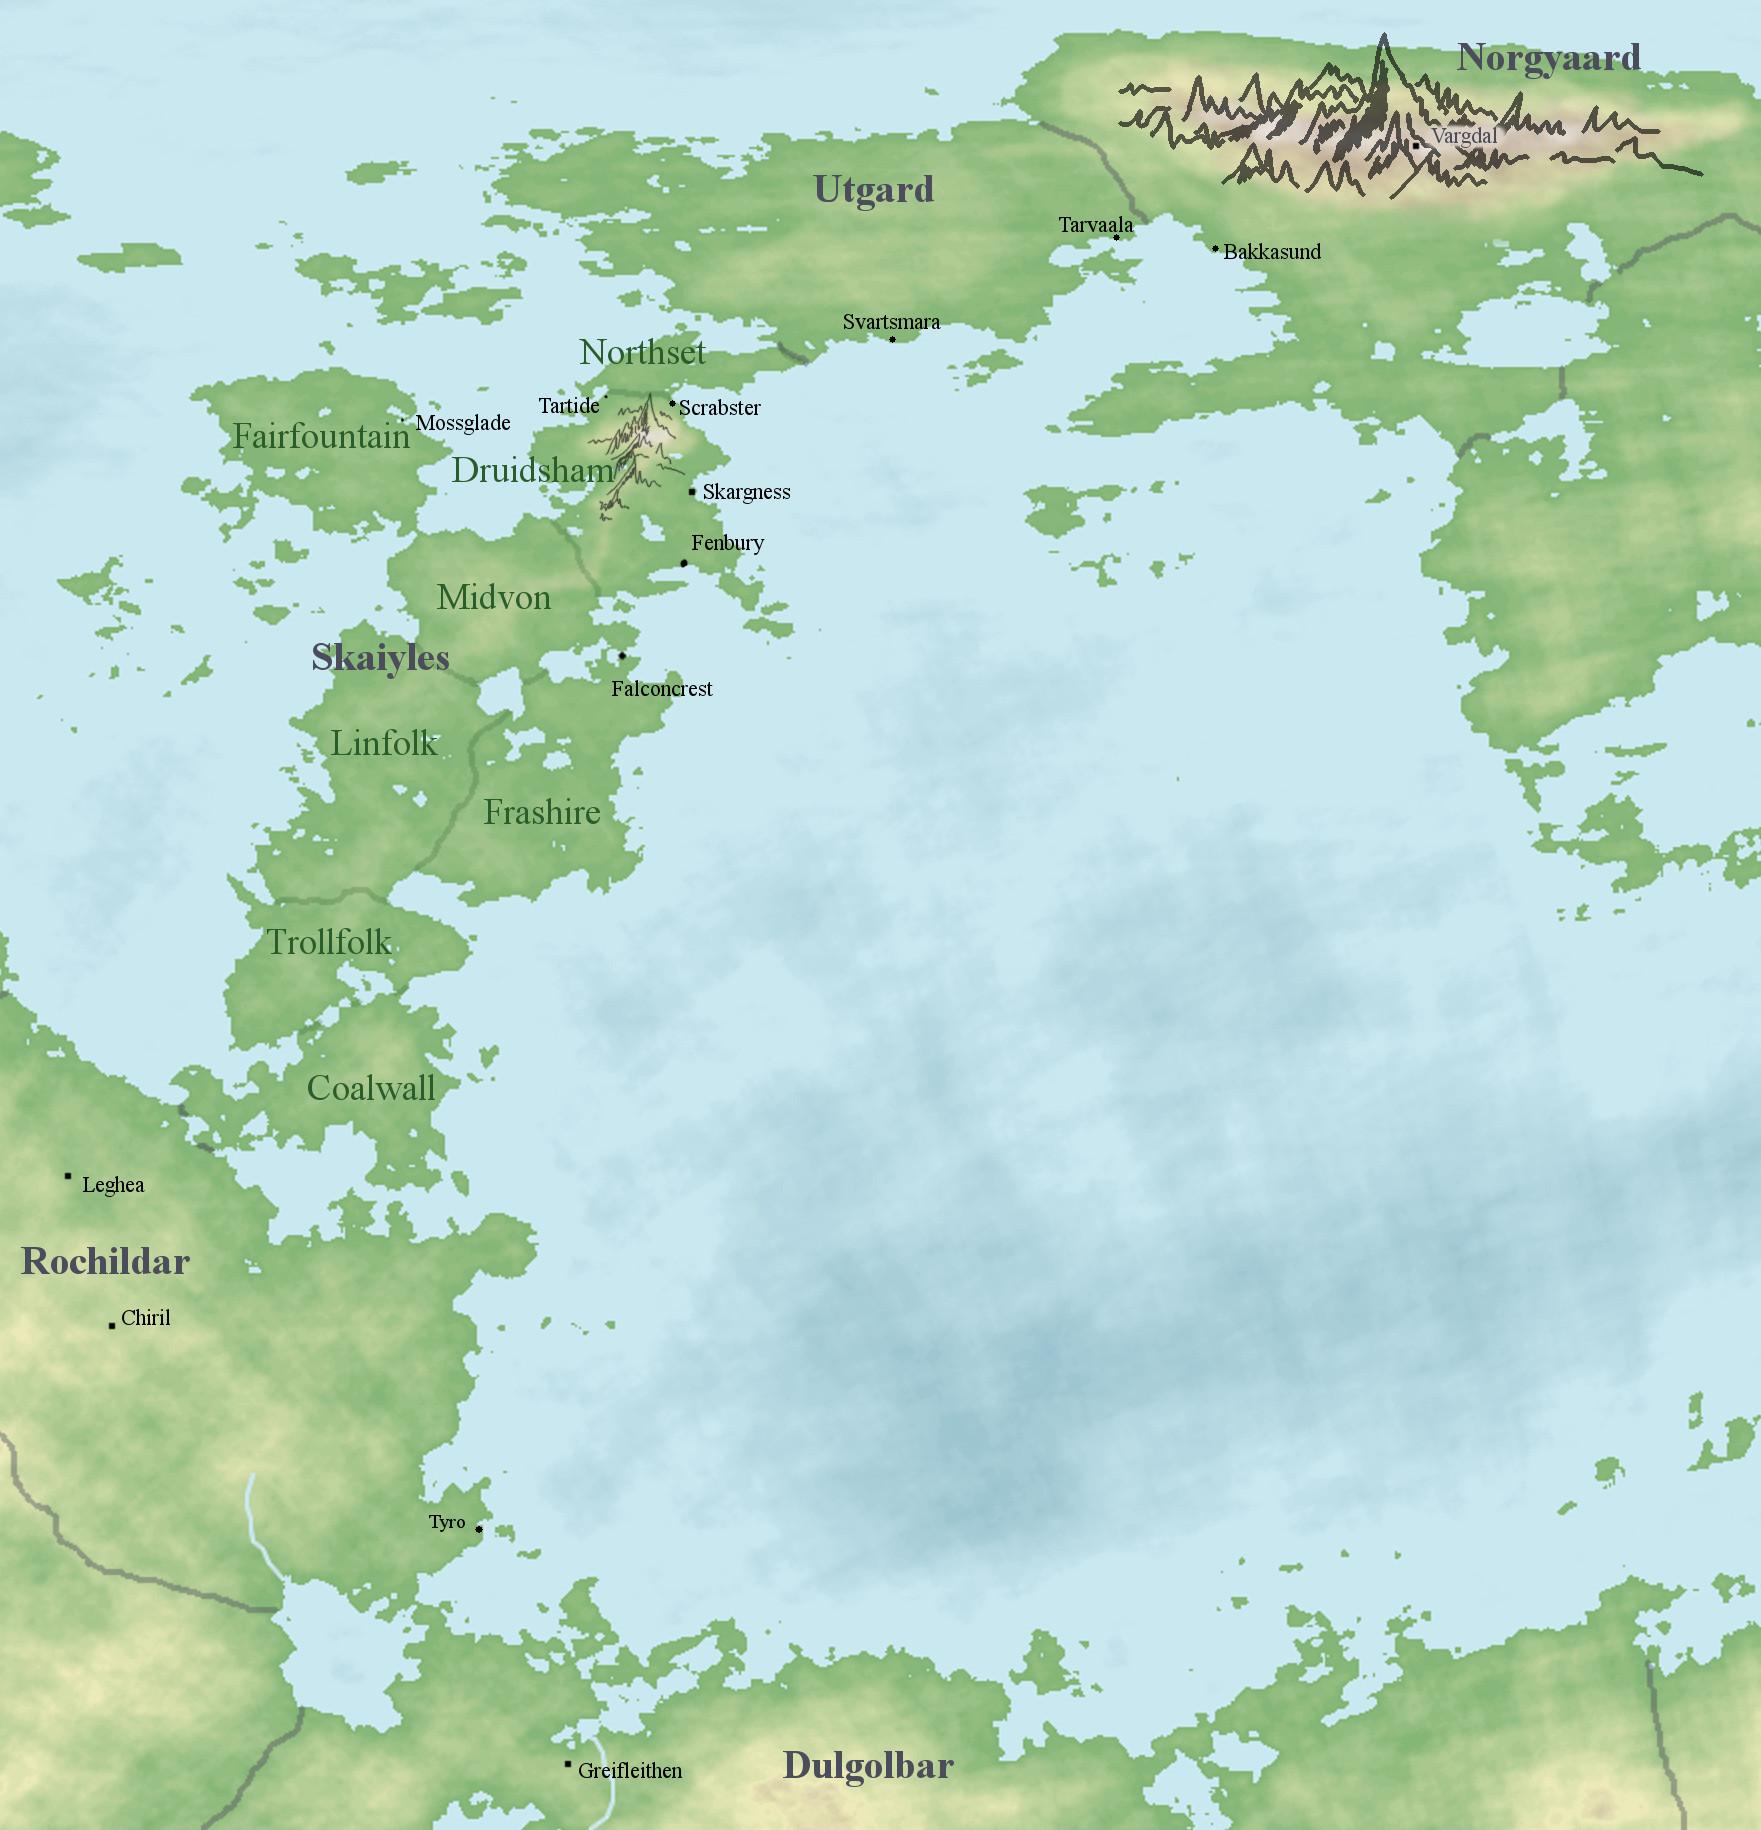 Karte von Skaiyles